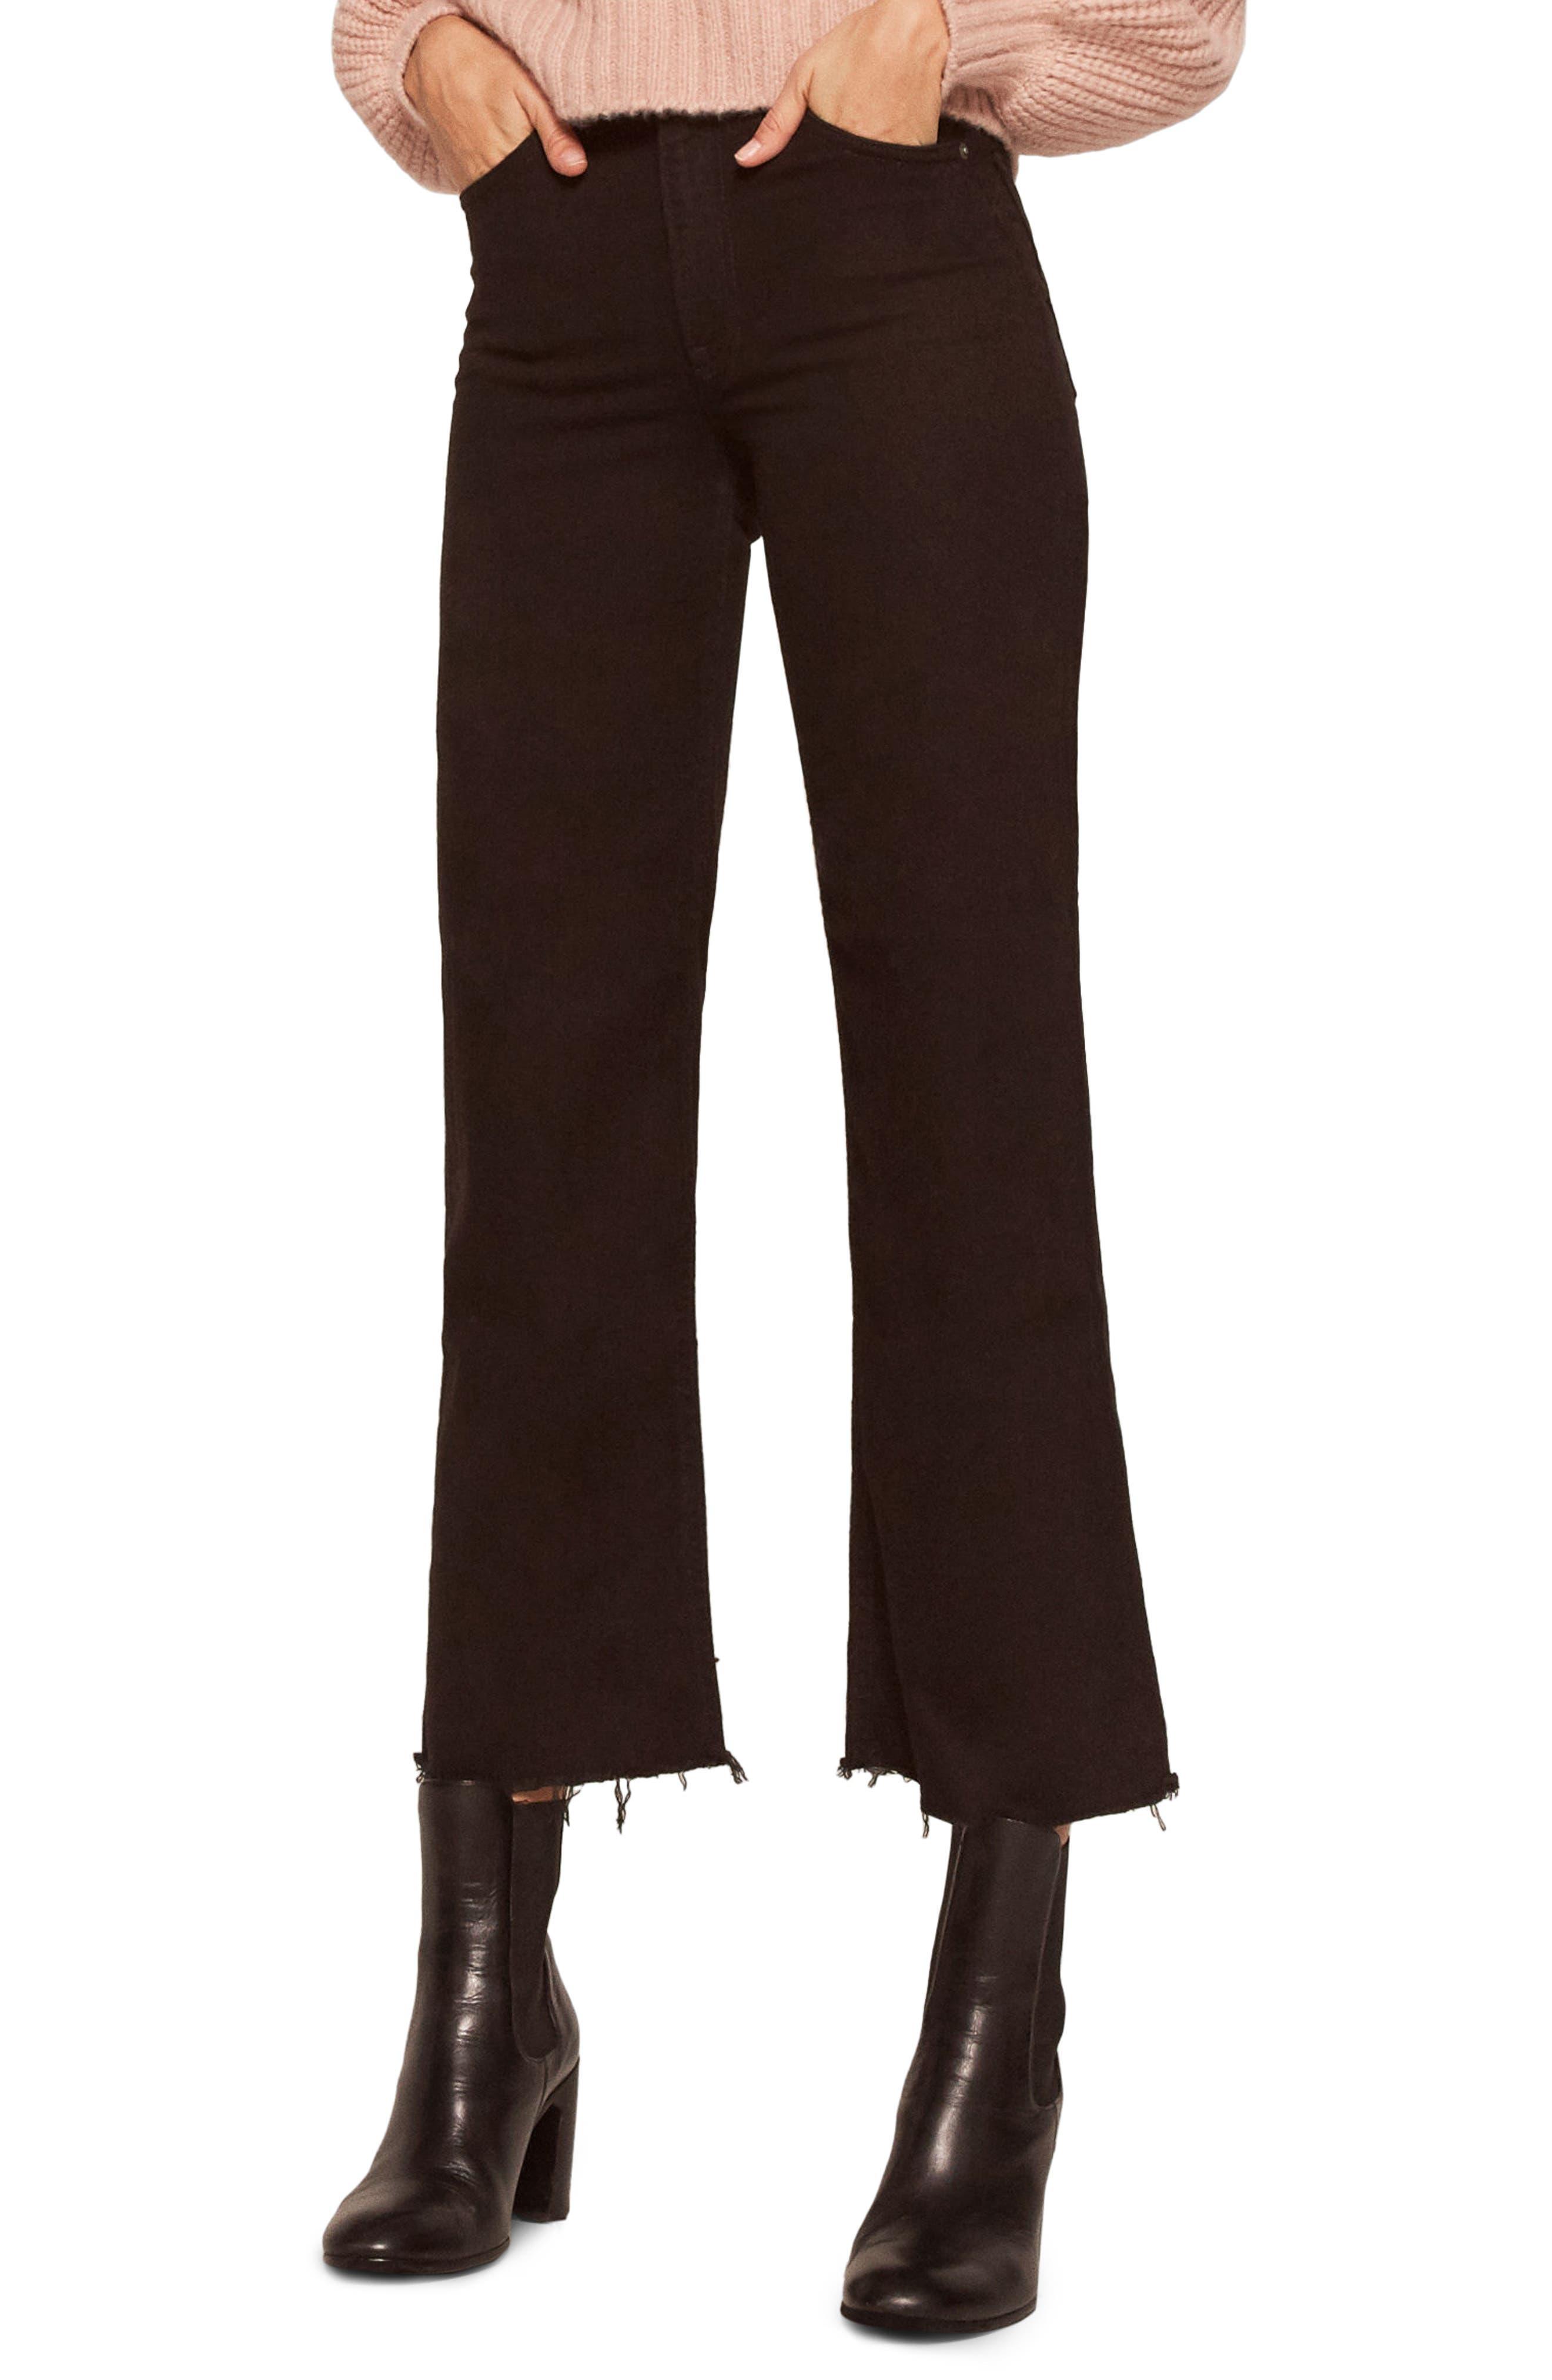 Stretch Crop Jeans,                             Main thumbnail 1, color,                             001